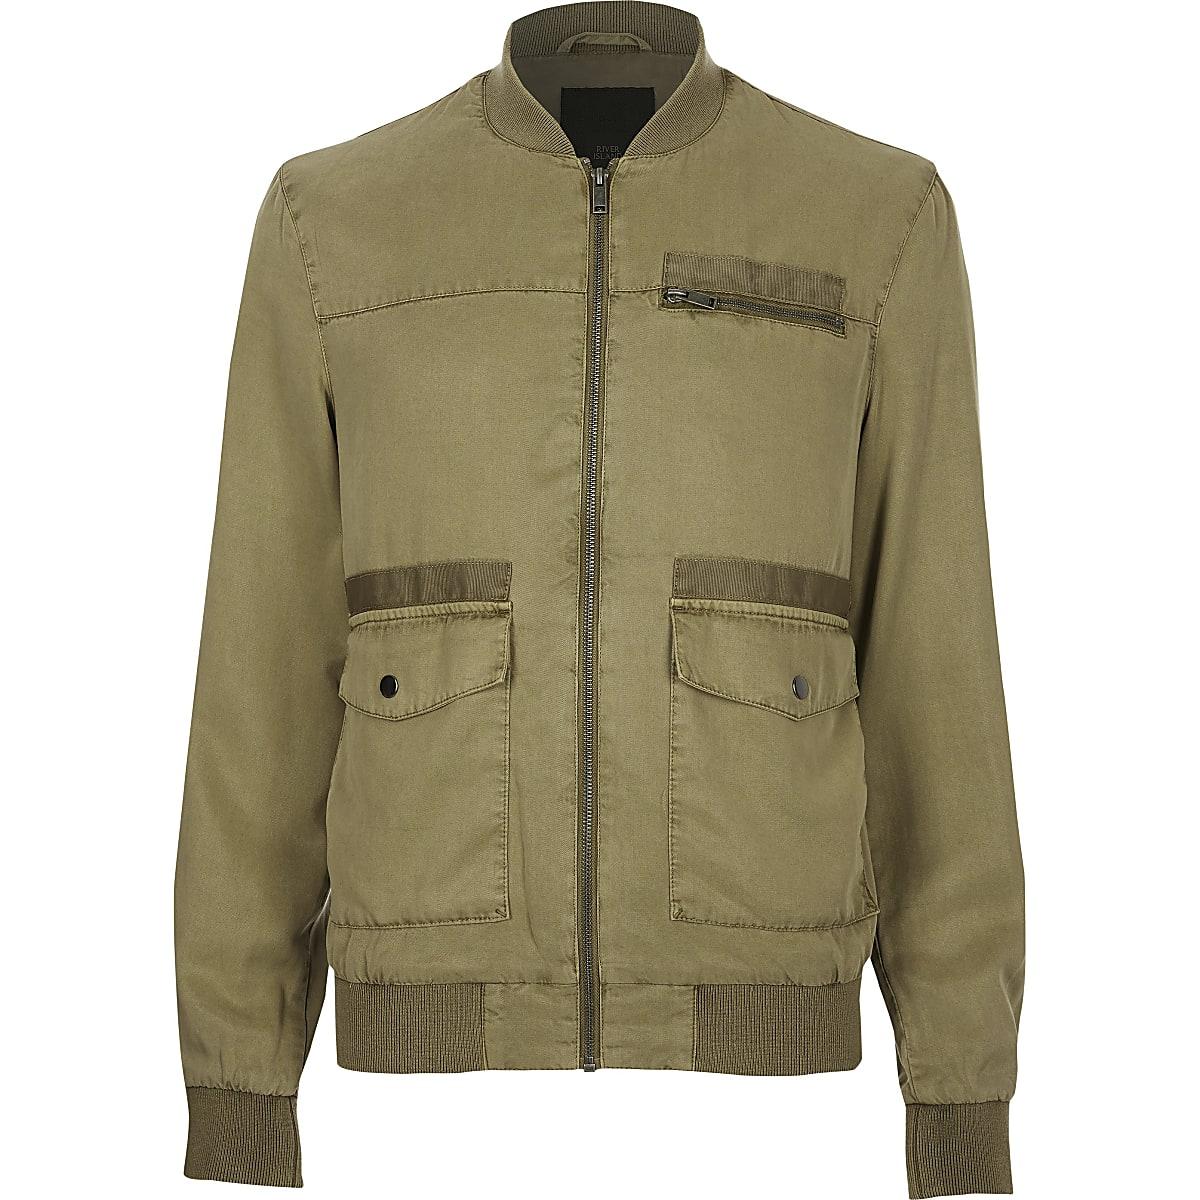 79de20803 Khaki utility zip front bomber jacket